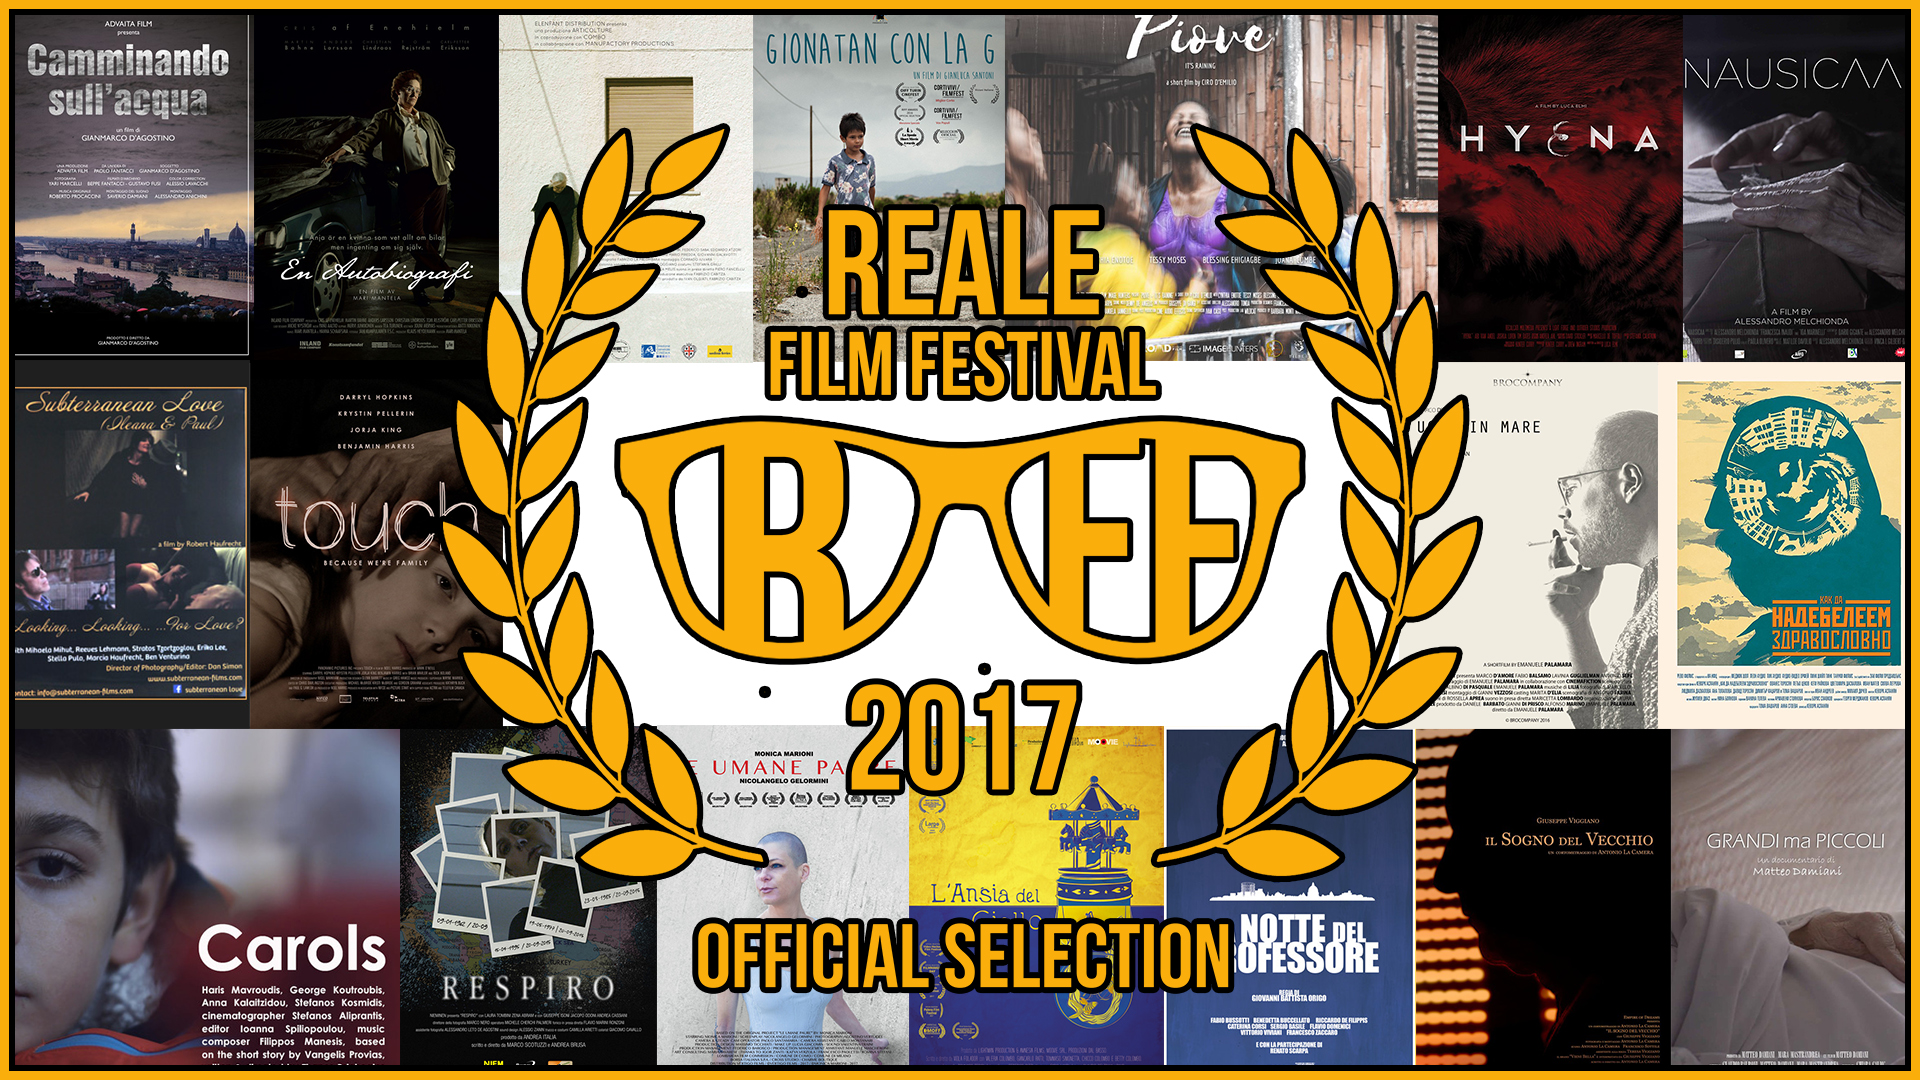 Reale Film Festival – I finalisti / Finalists